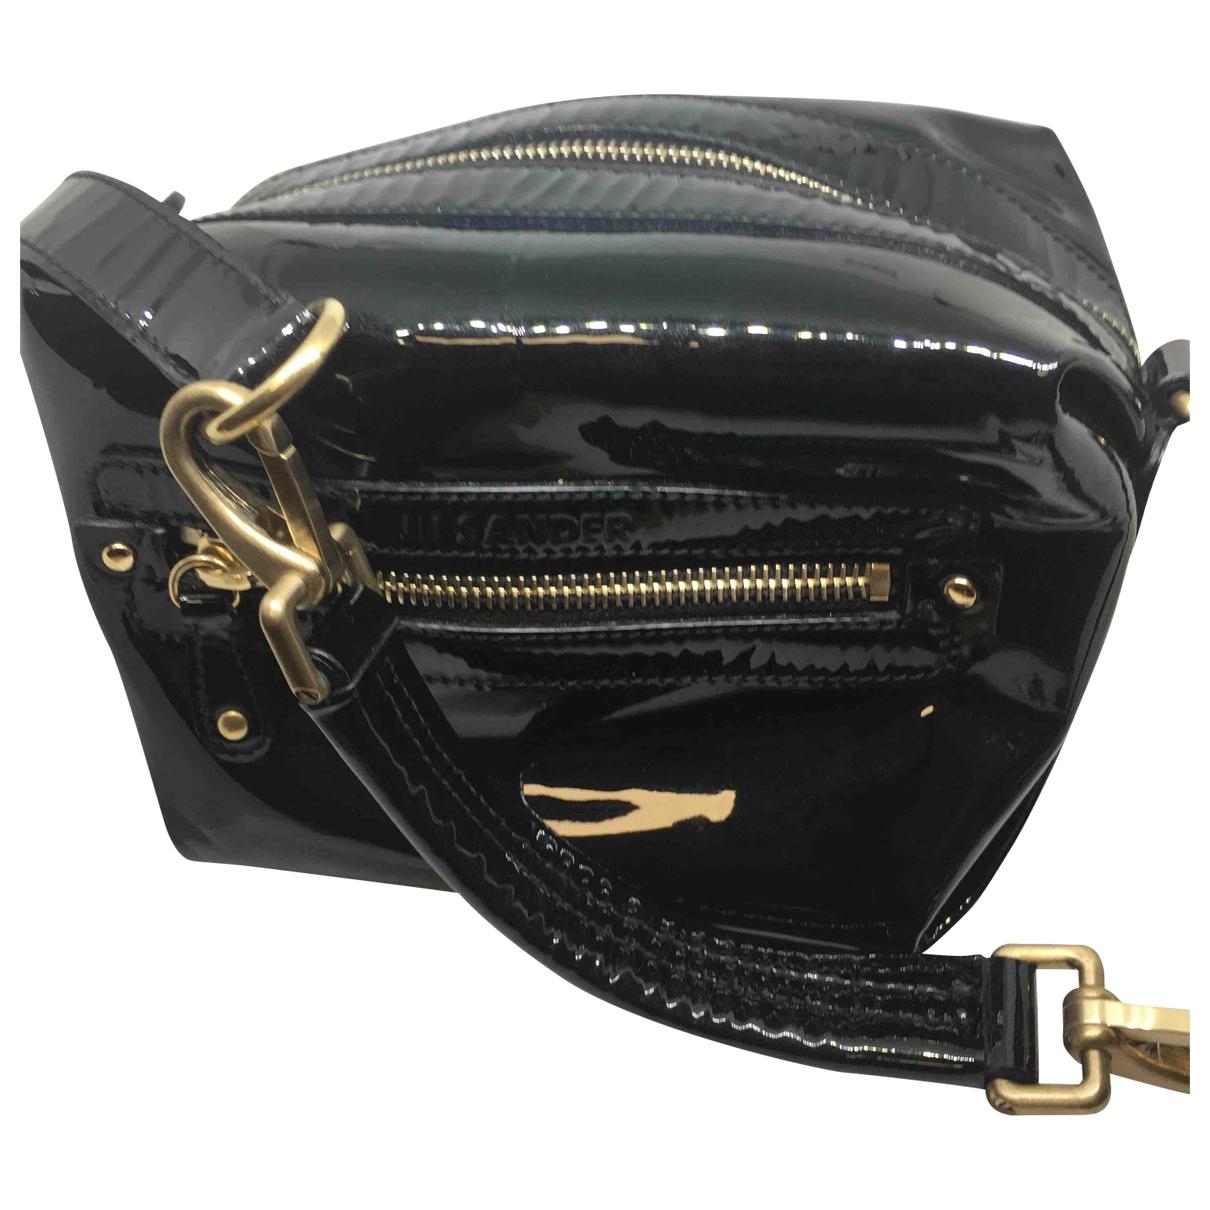 Jil Sander \N Handtasche in  Schwarz Lackleder